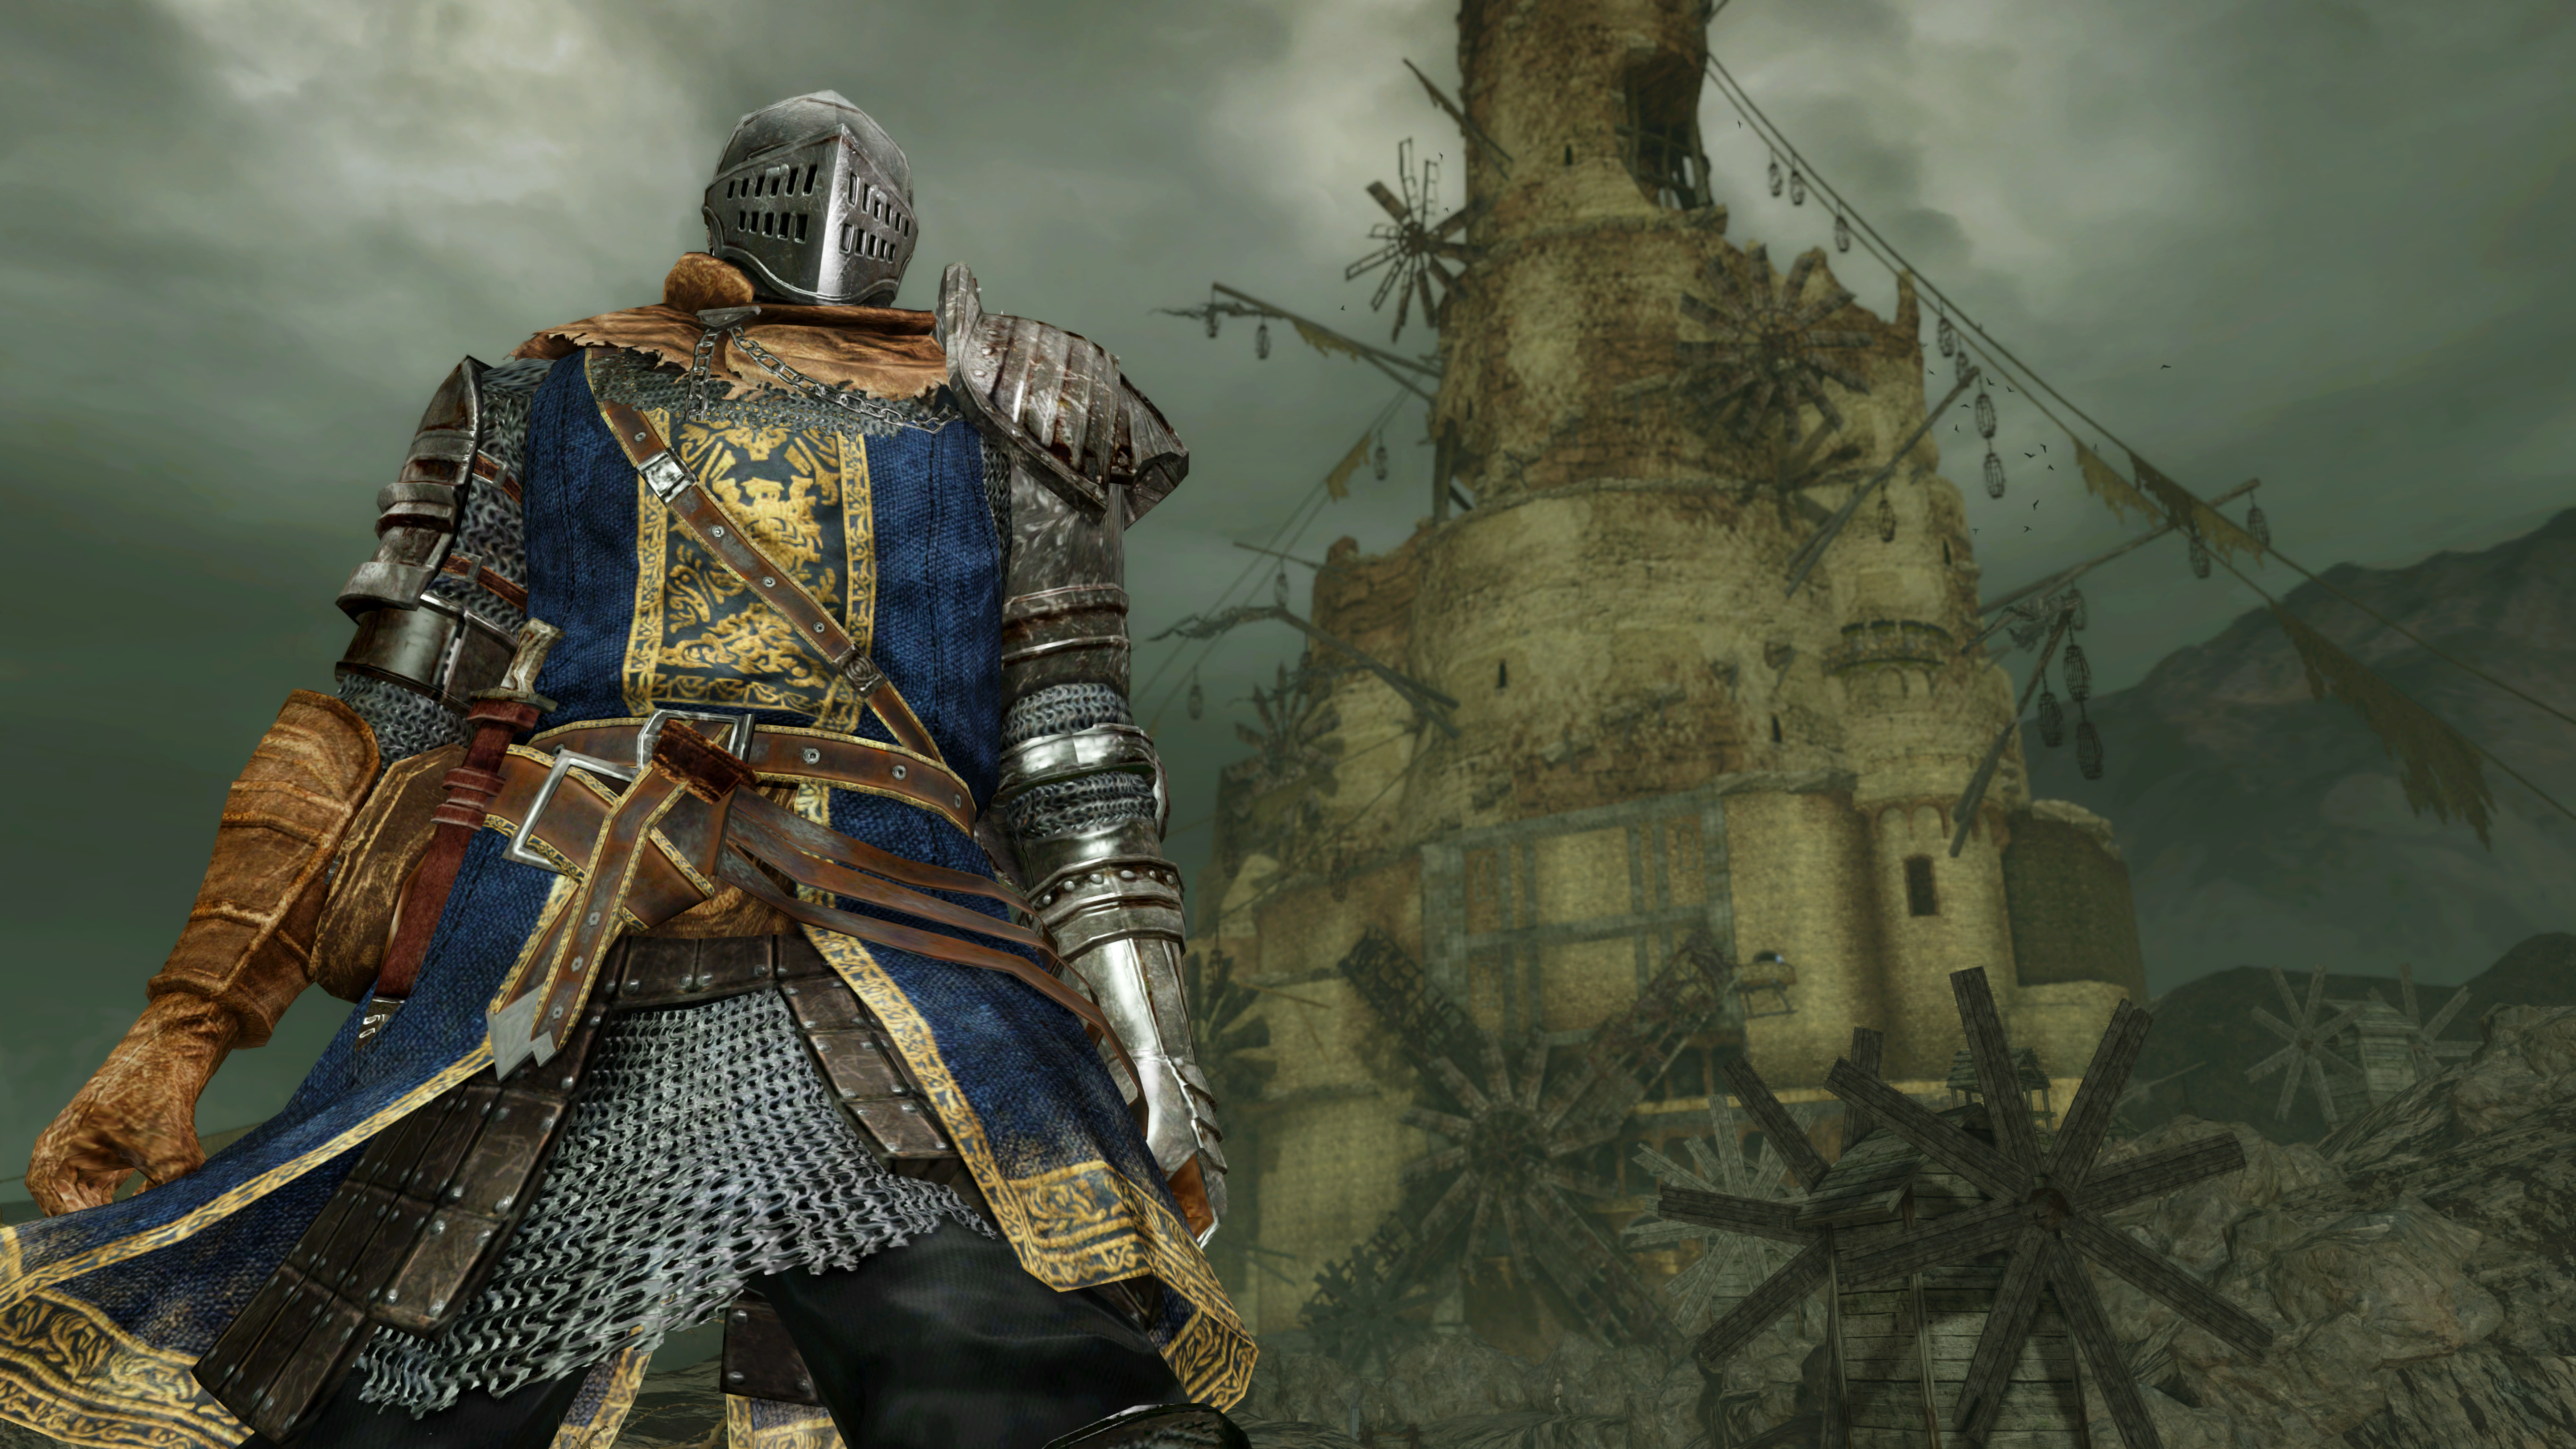 Brand New Dark Souls 2 4K Screenshots Showcase: Explore